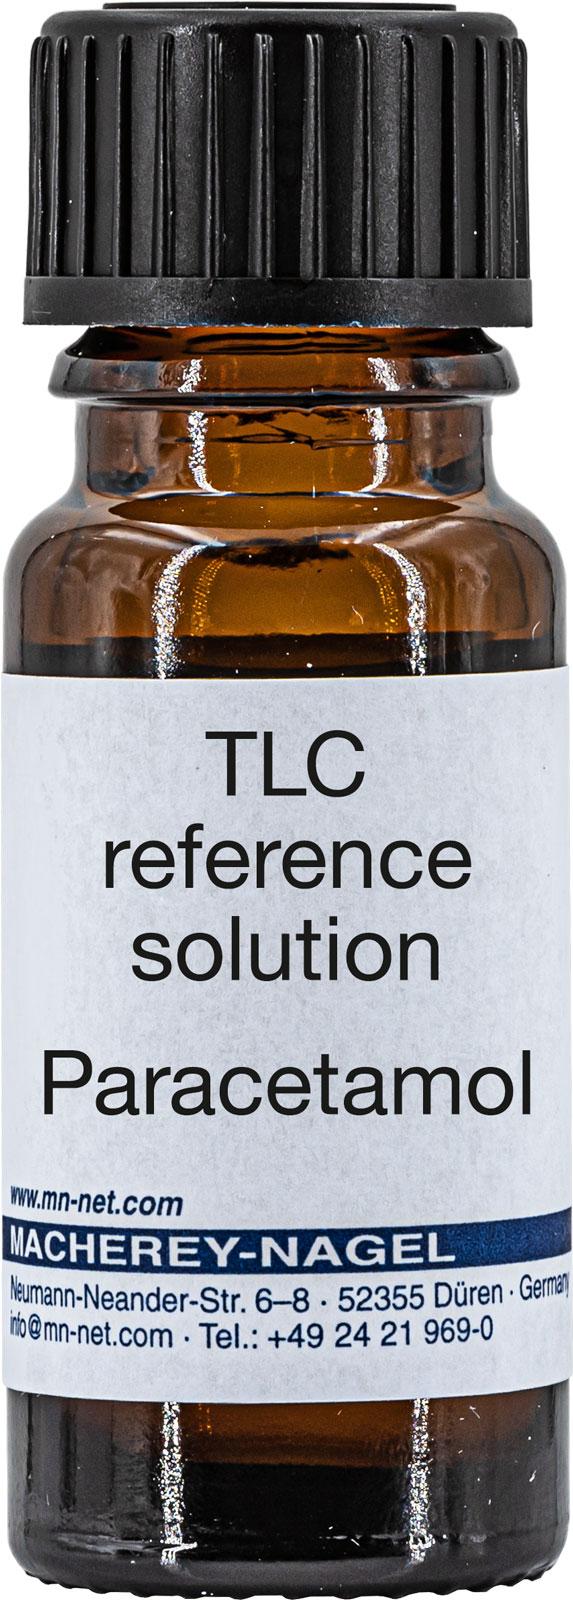 Paracetamol-Vergleichslösung, 8 mL